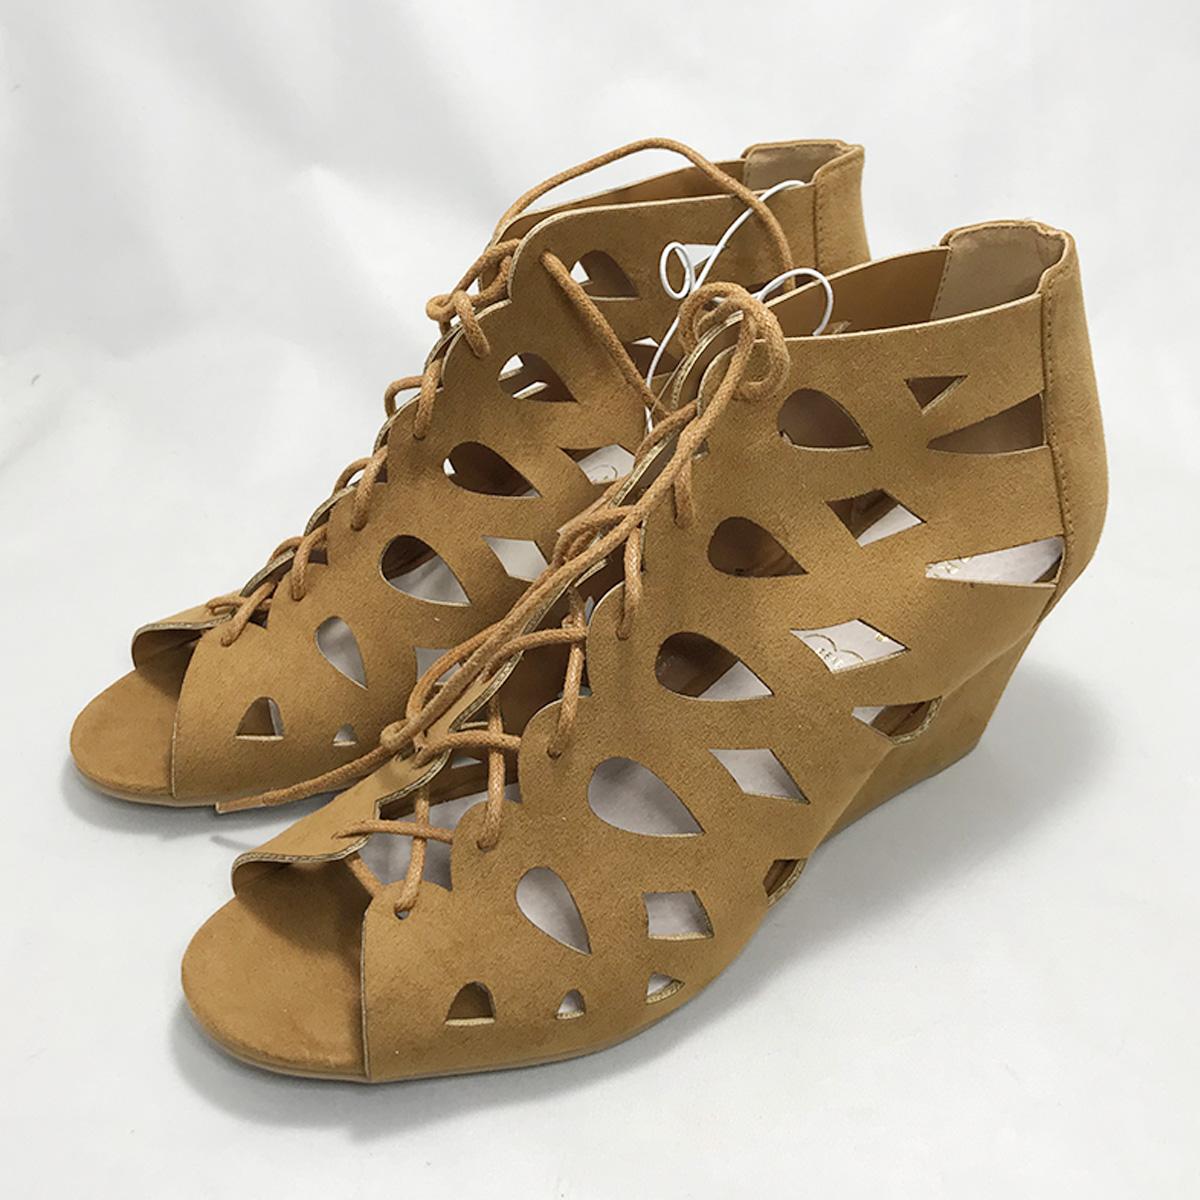 Primark Lace Up Block Heel Peep Toe